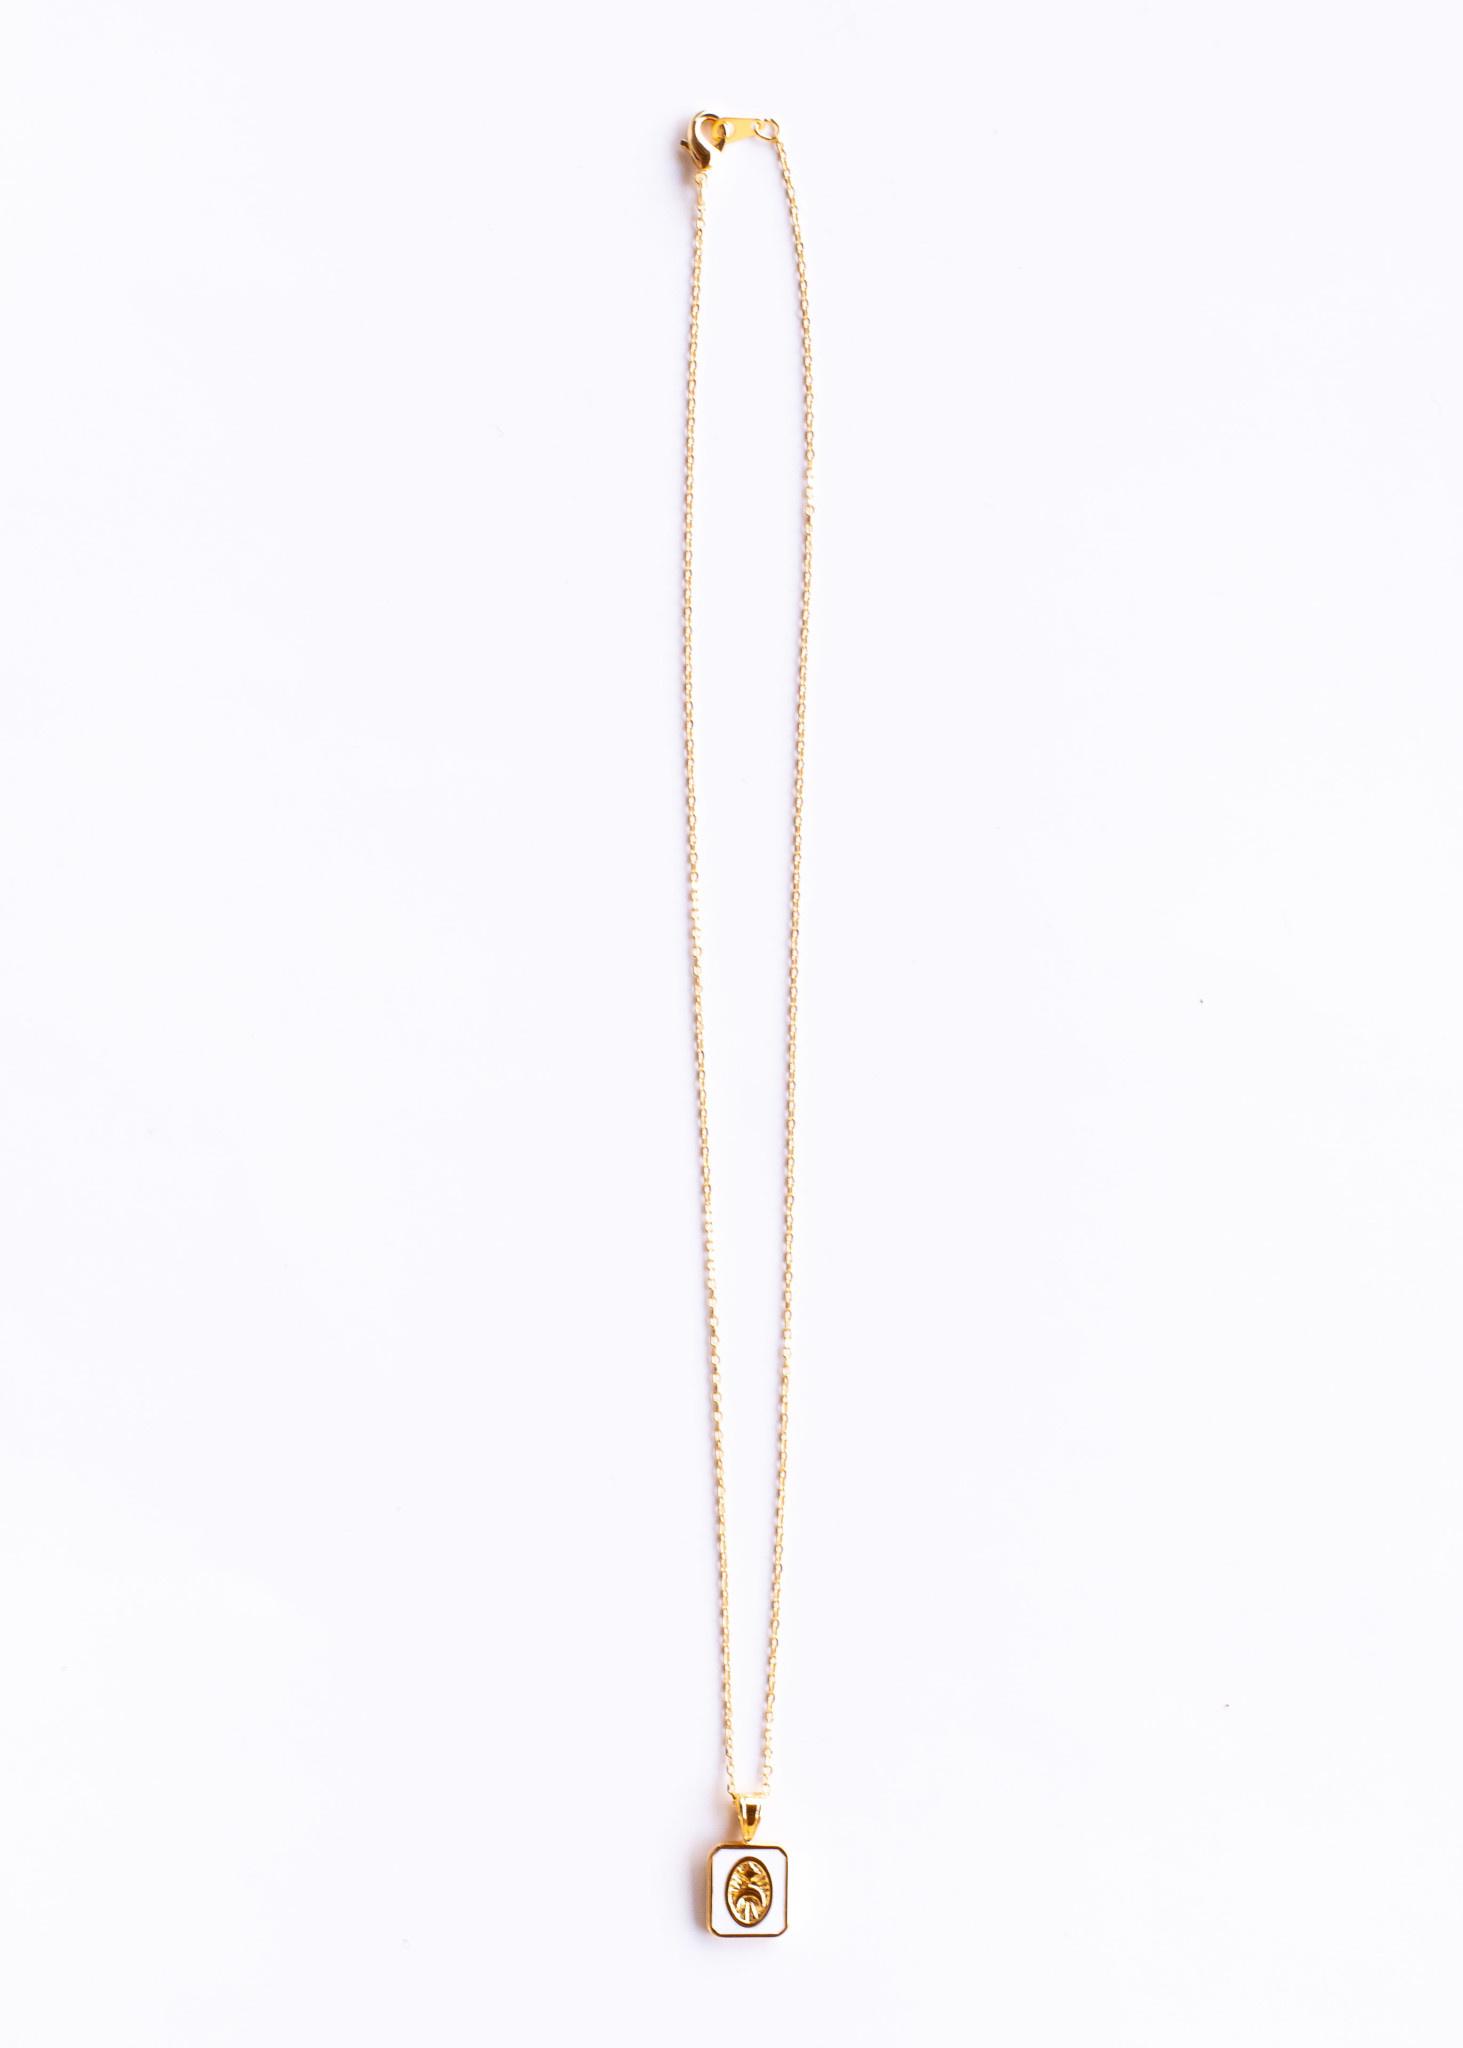 ROUTINE NECKLACE - WHITE